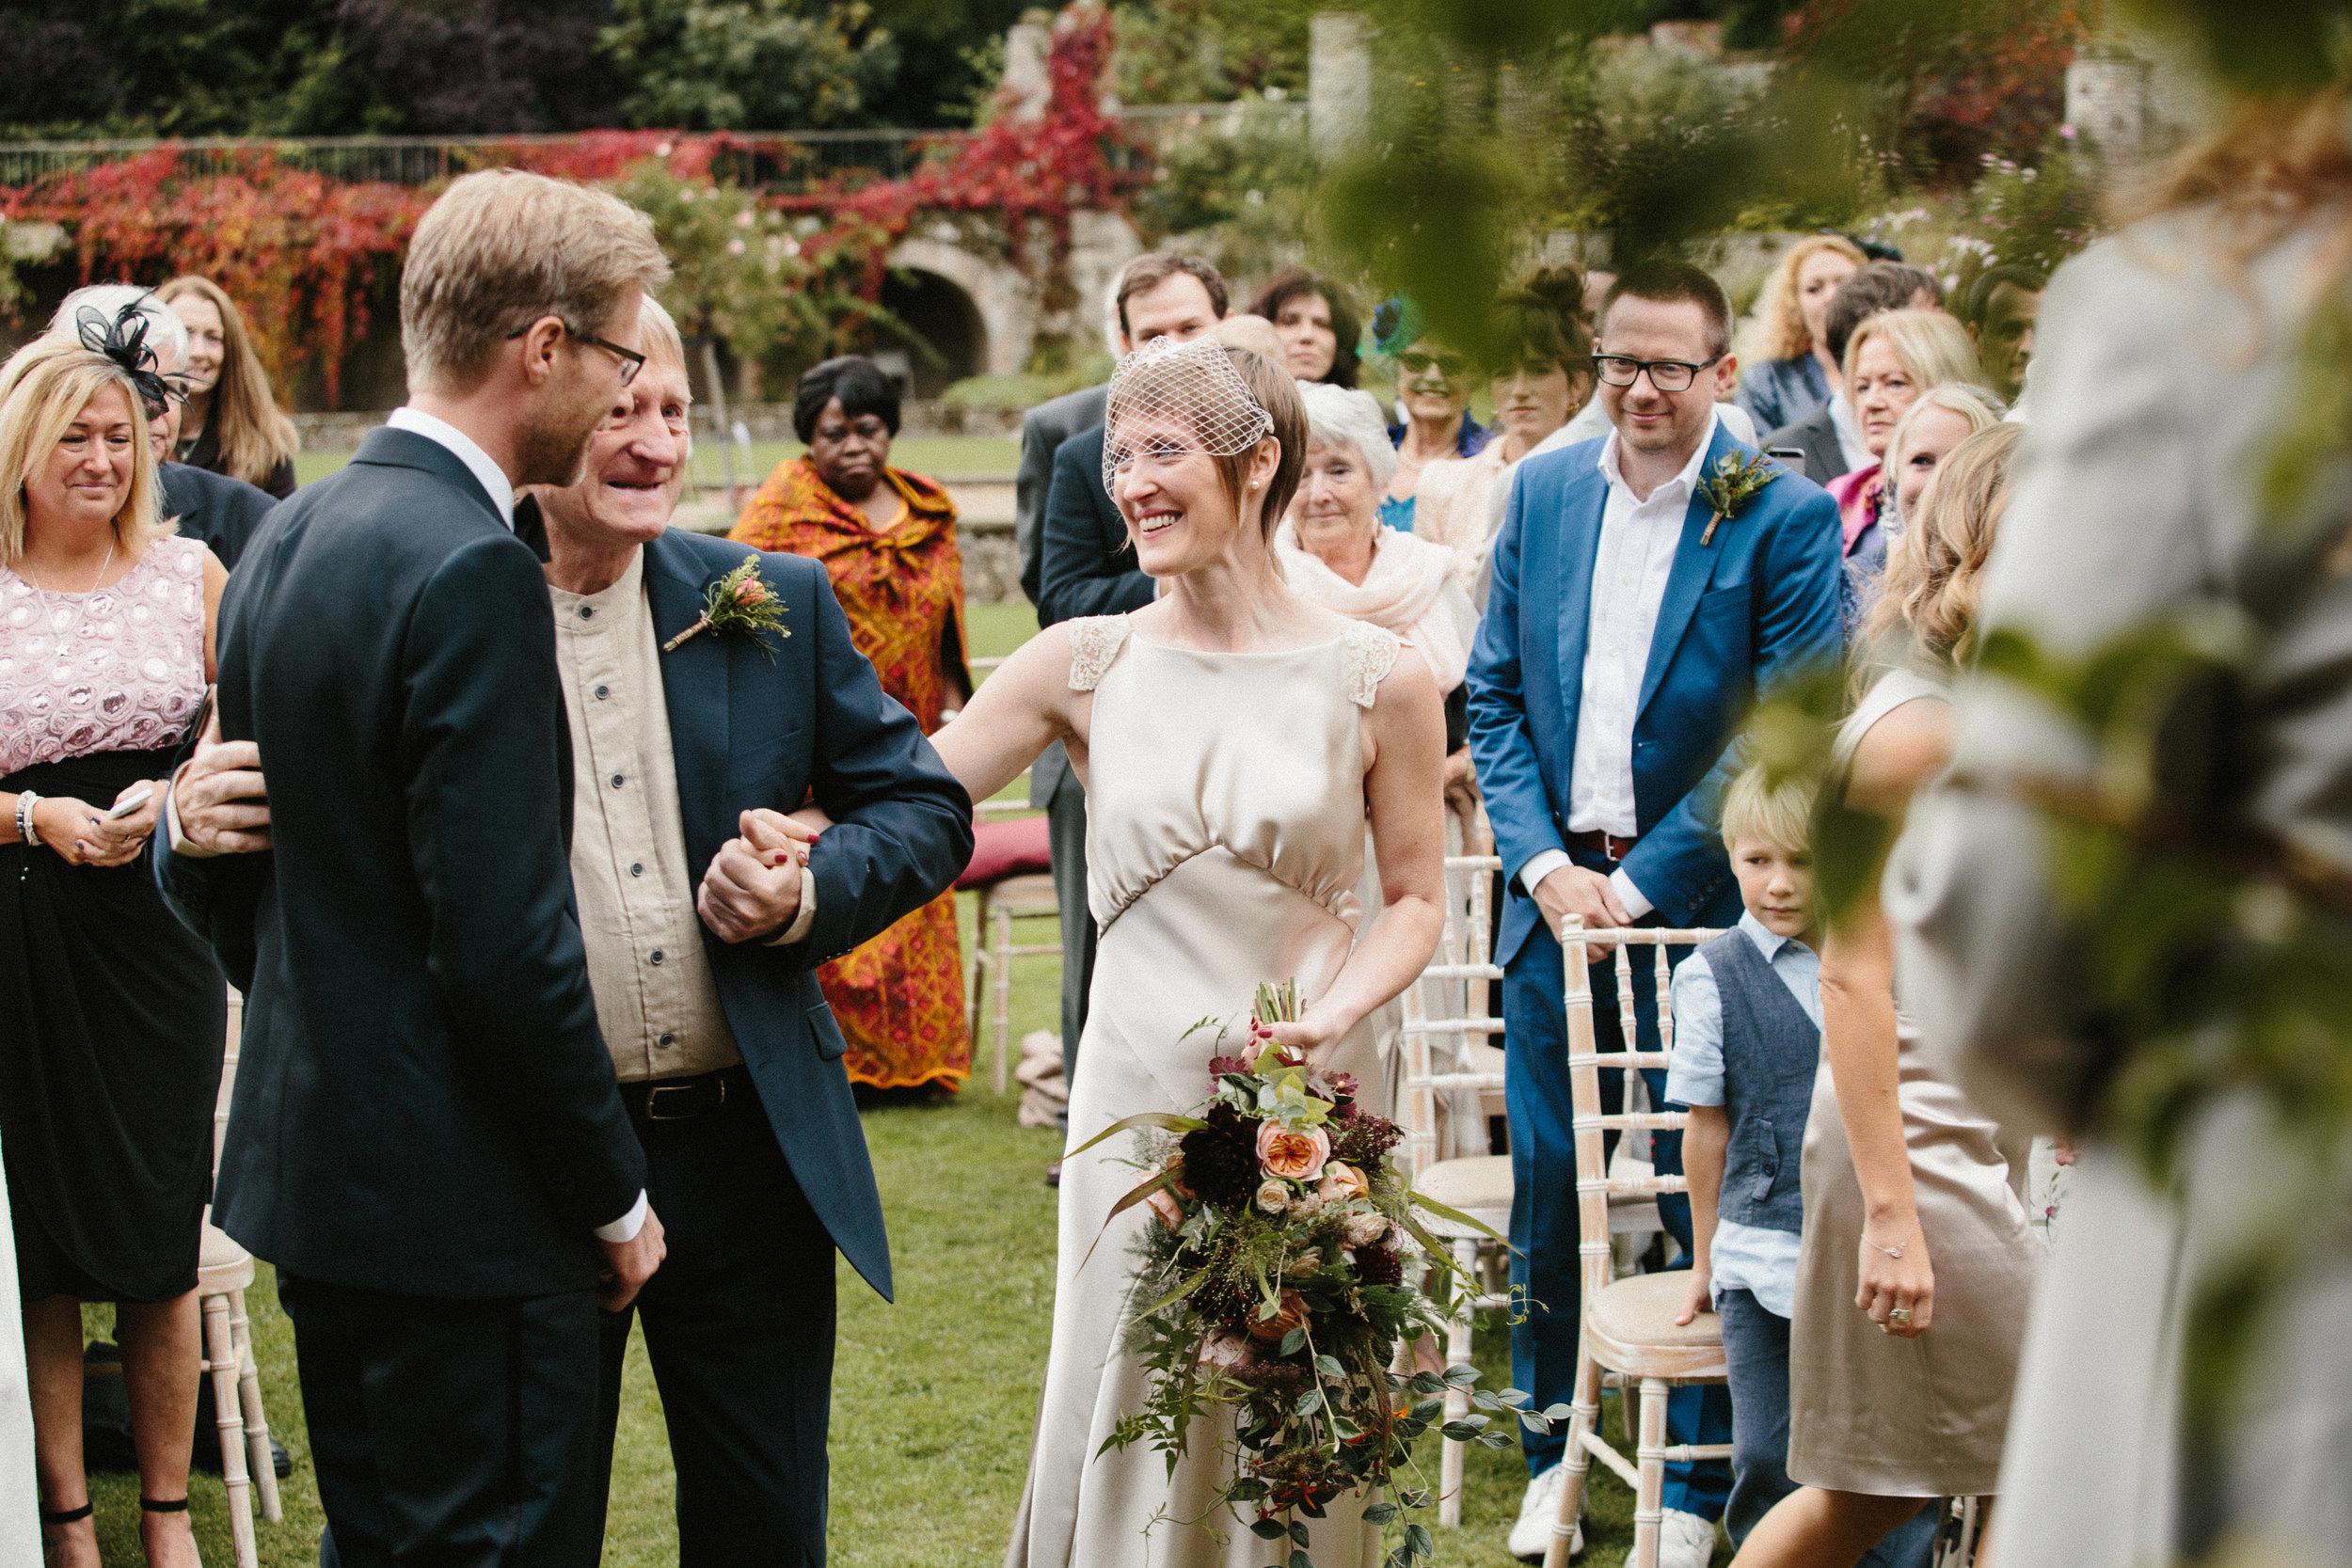 Kate-Beaumont-Sheffield-Honeysuckle-bias-cut-wedding-dress-oyster-Rosie5.jpg